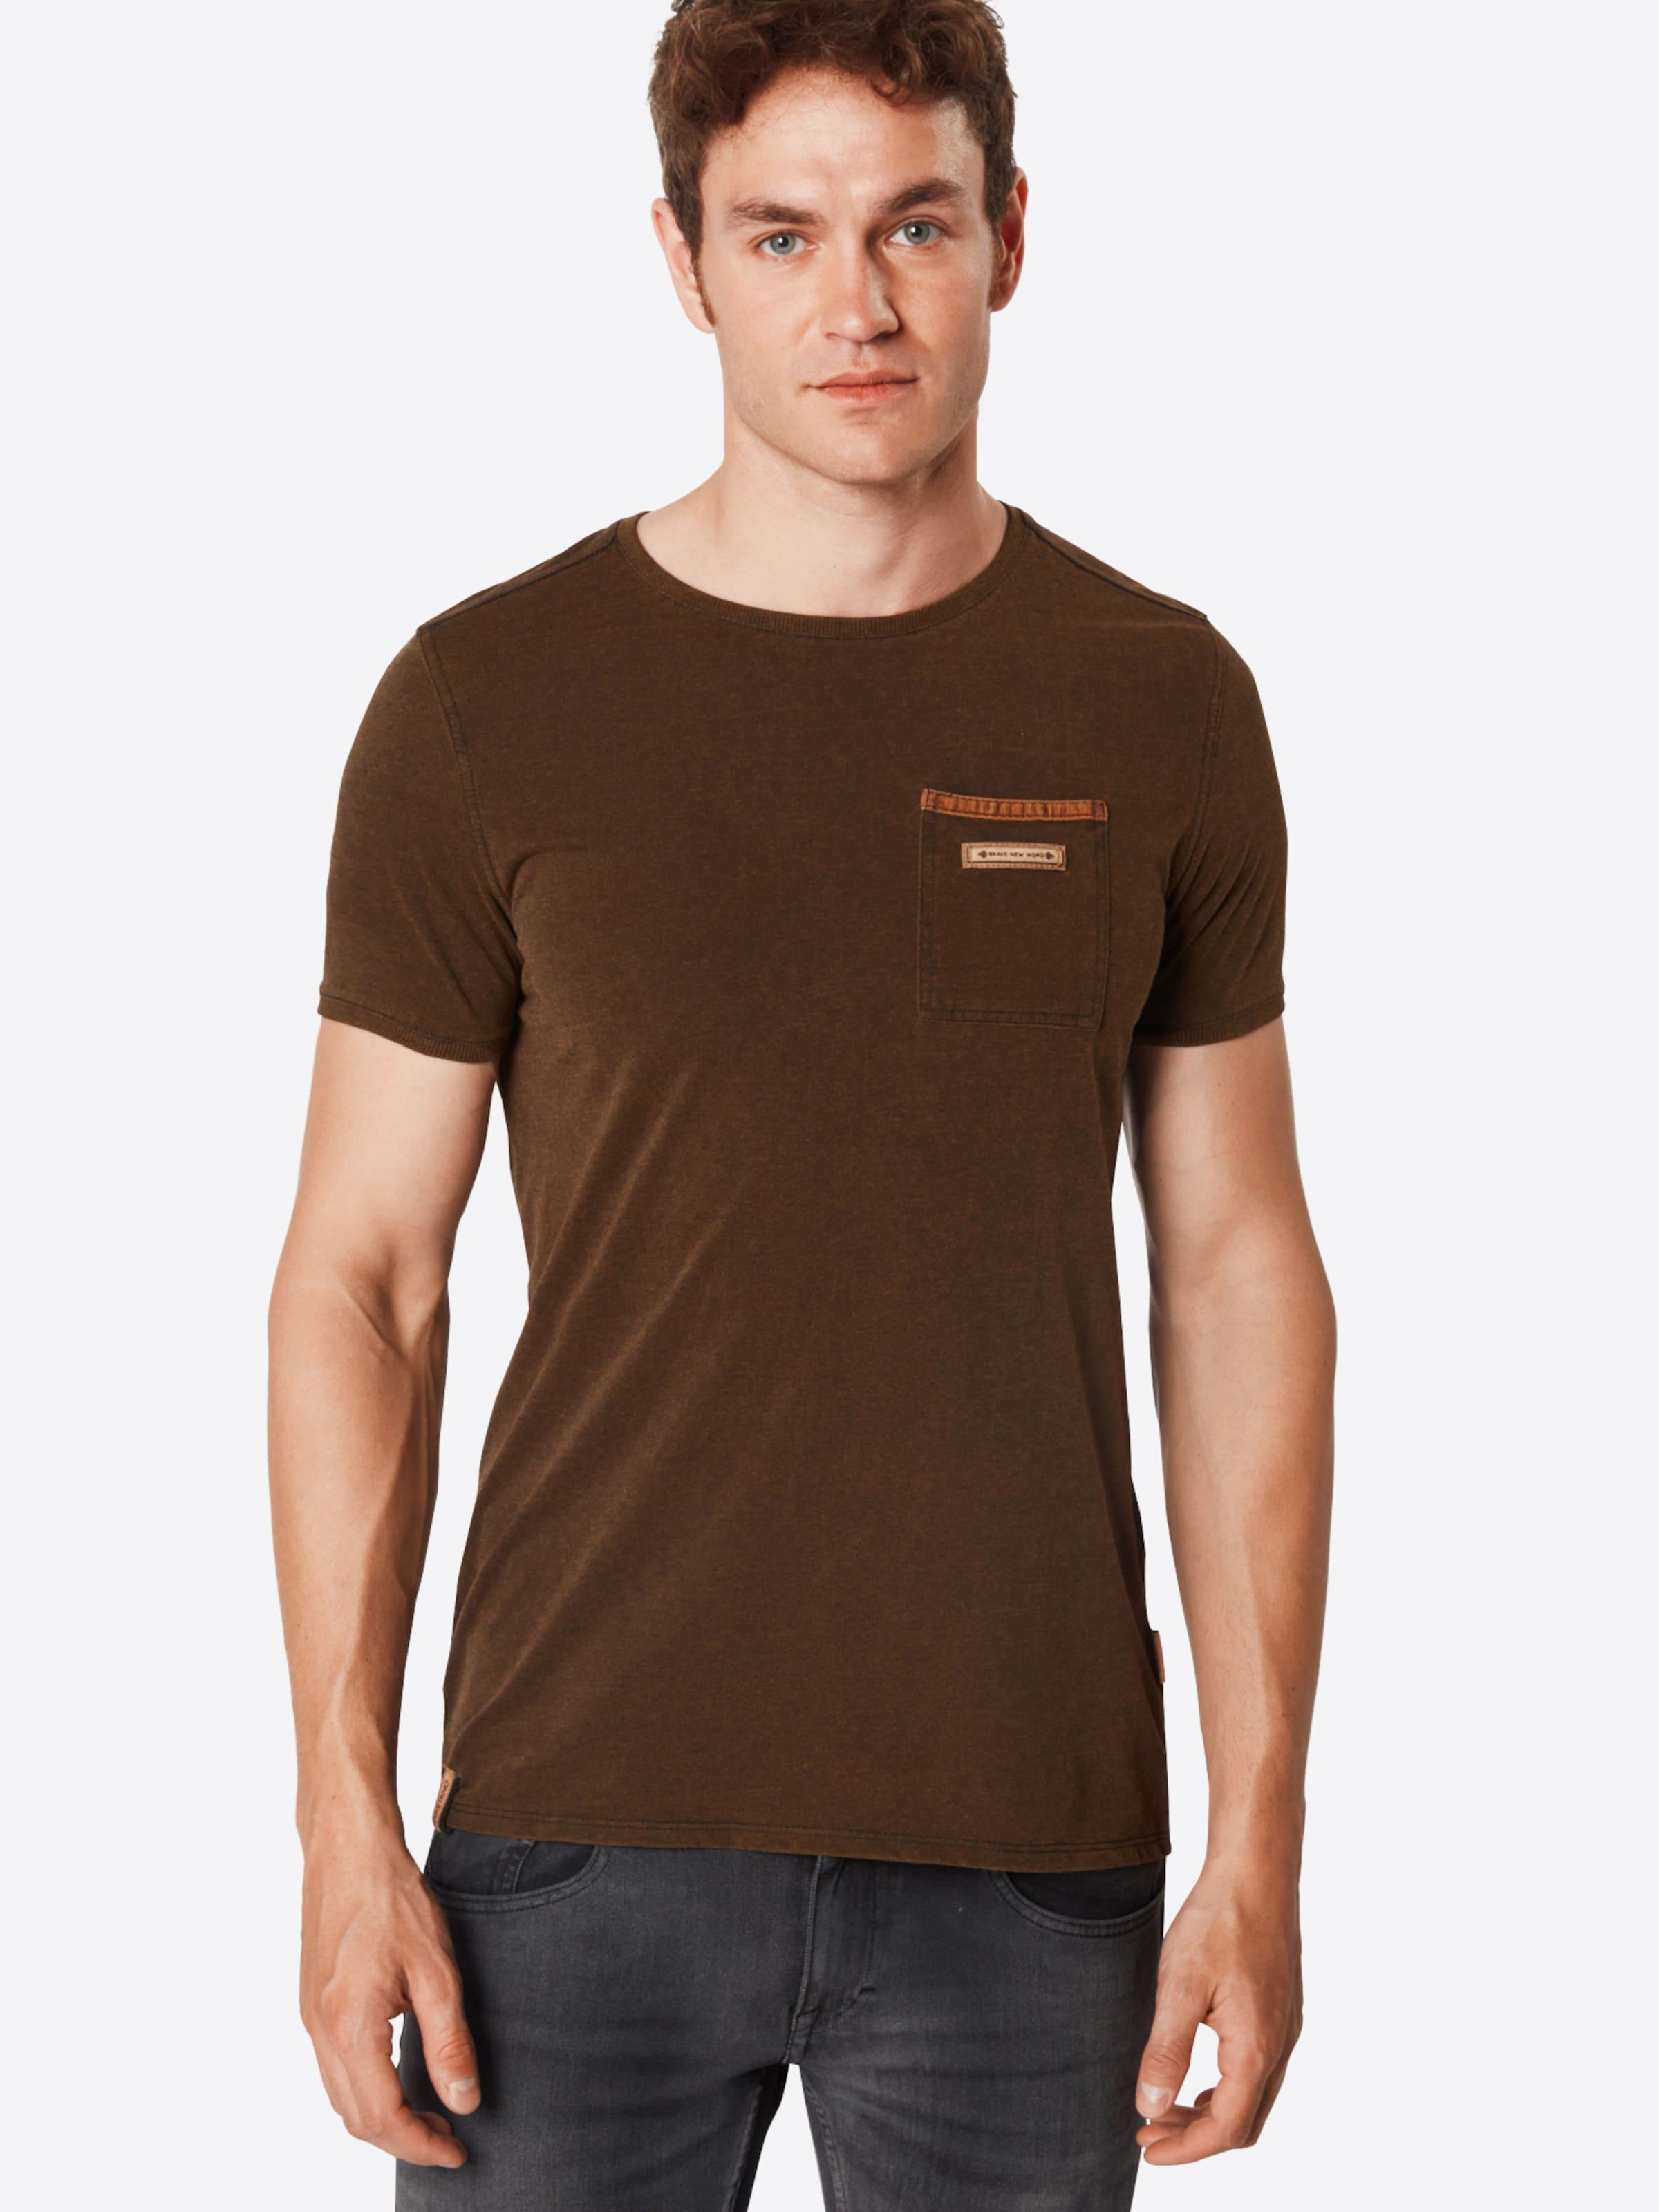 T 'suppenkasper' shirt Dunkelbraun In Naketano sxtdQrhC